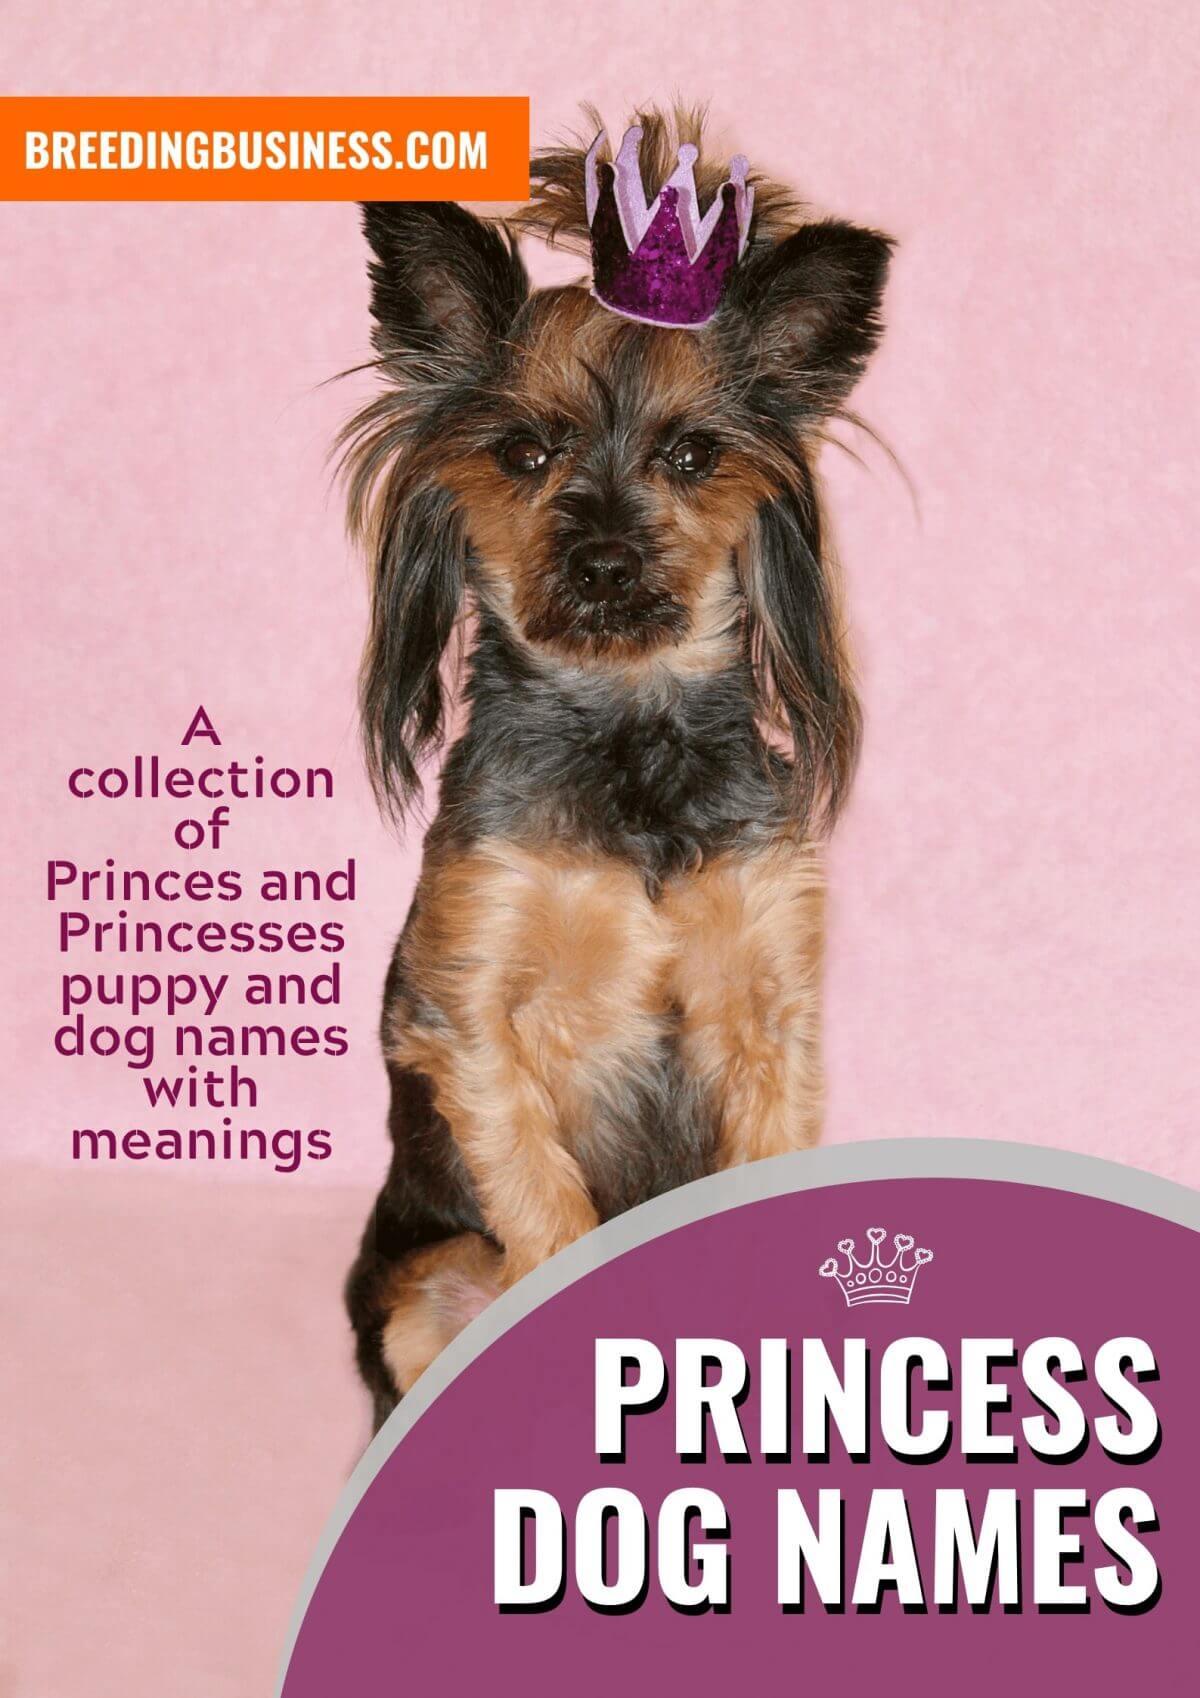 princely dog names